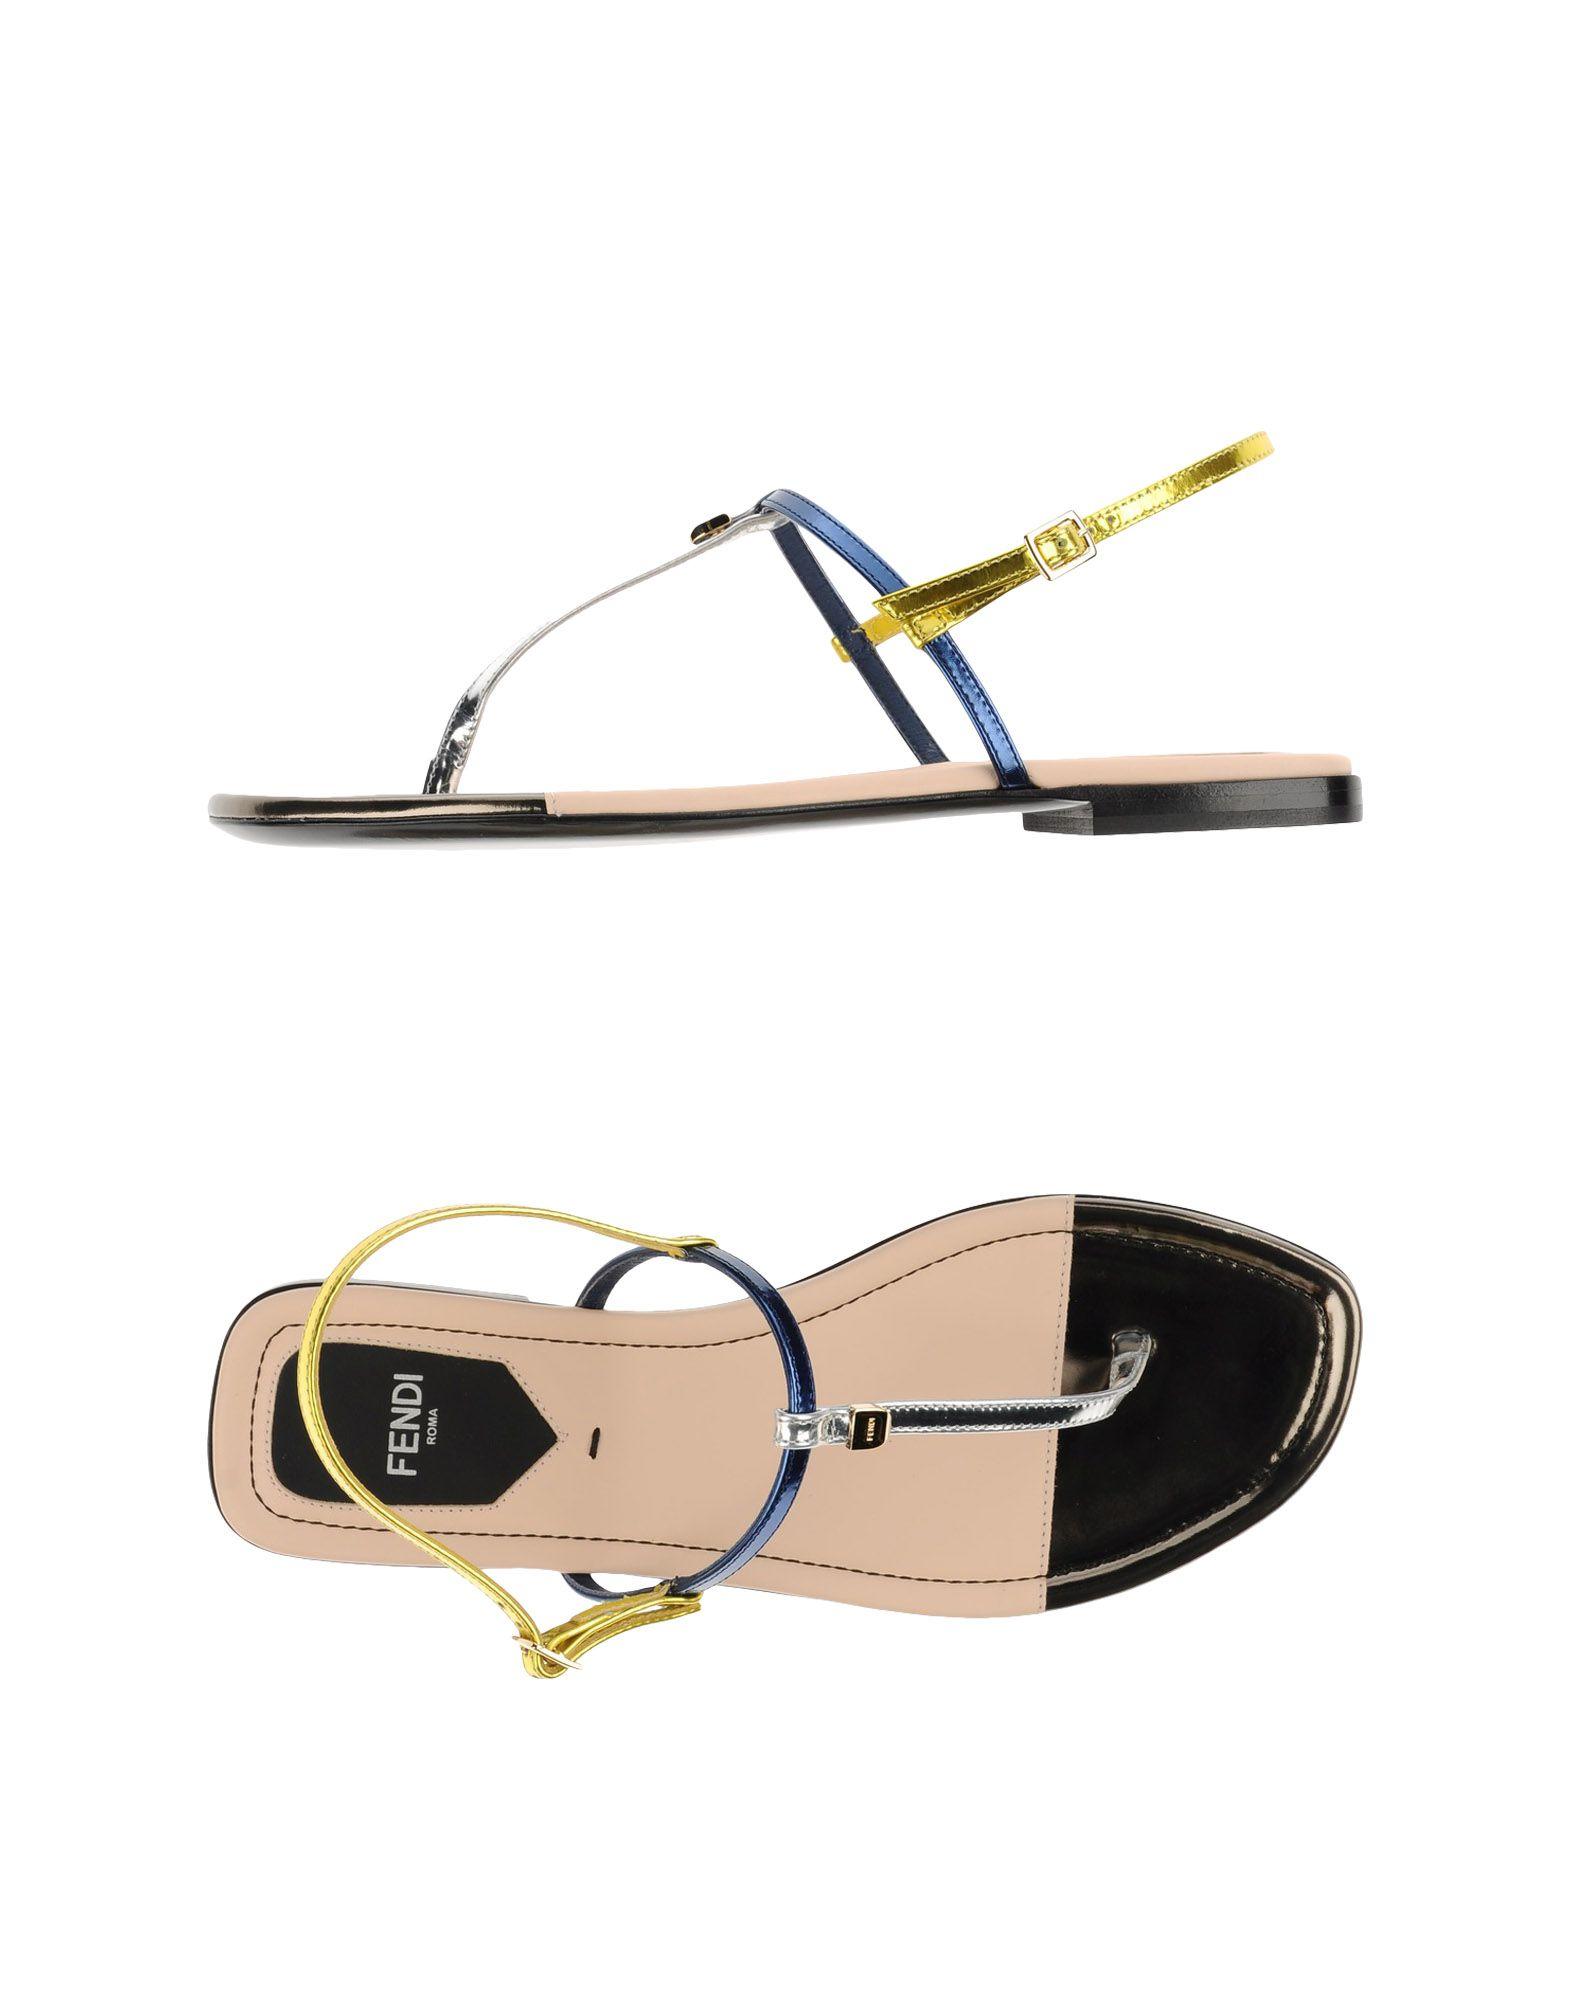 602b039f8053 Lyst - Fendi Thong Sandal in Metallic